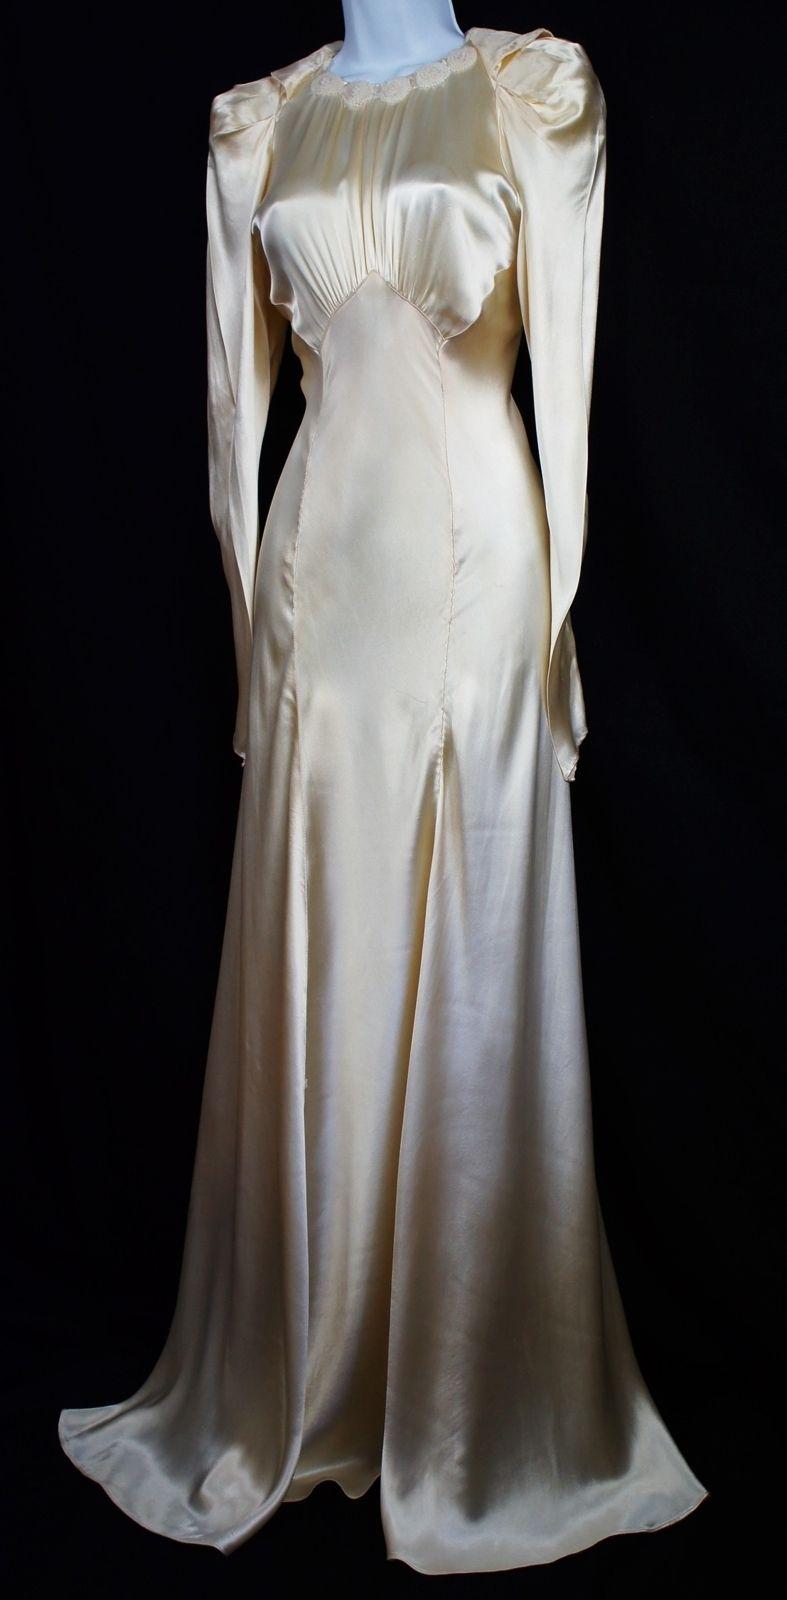 1930 wedding dress  Vintage s silk satin dress wedding ballgown goddess harlow